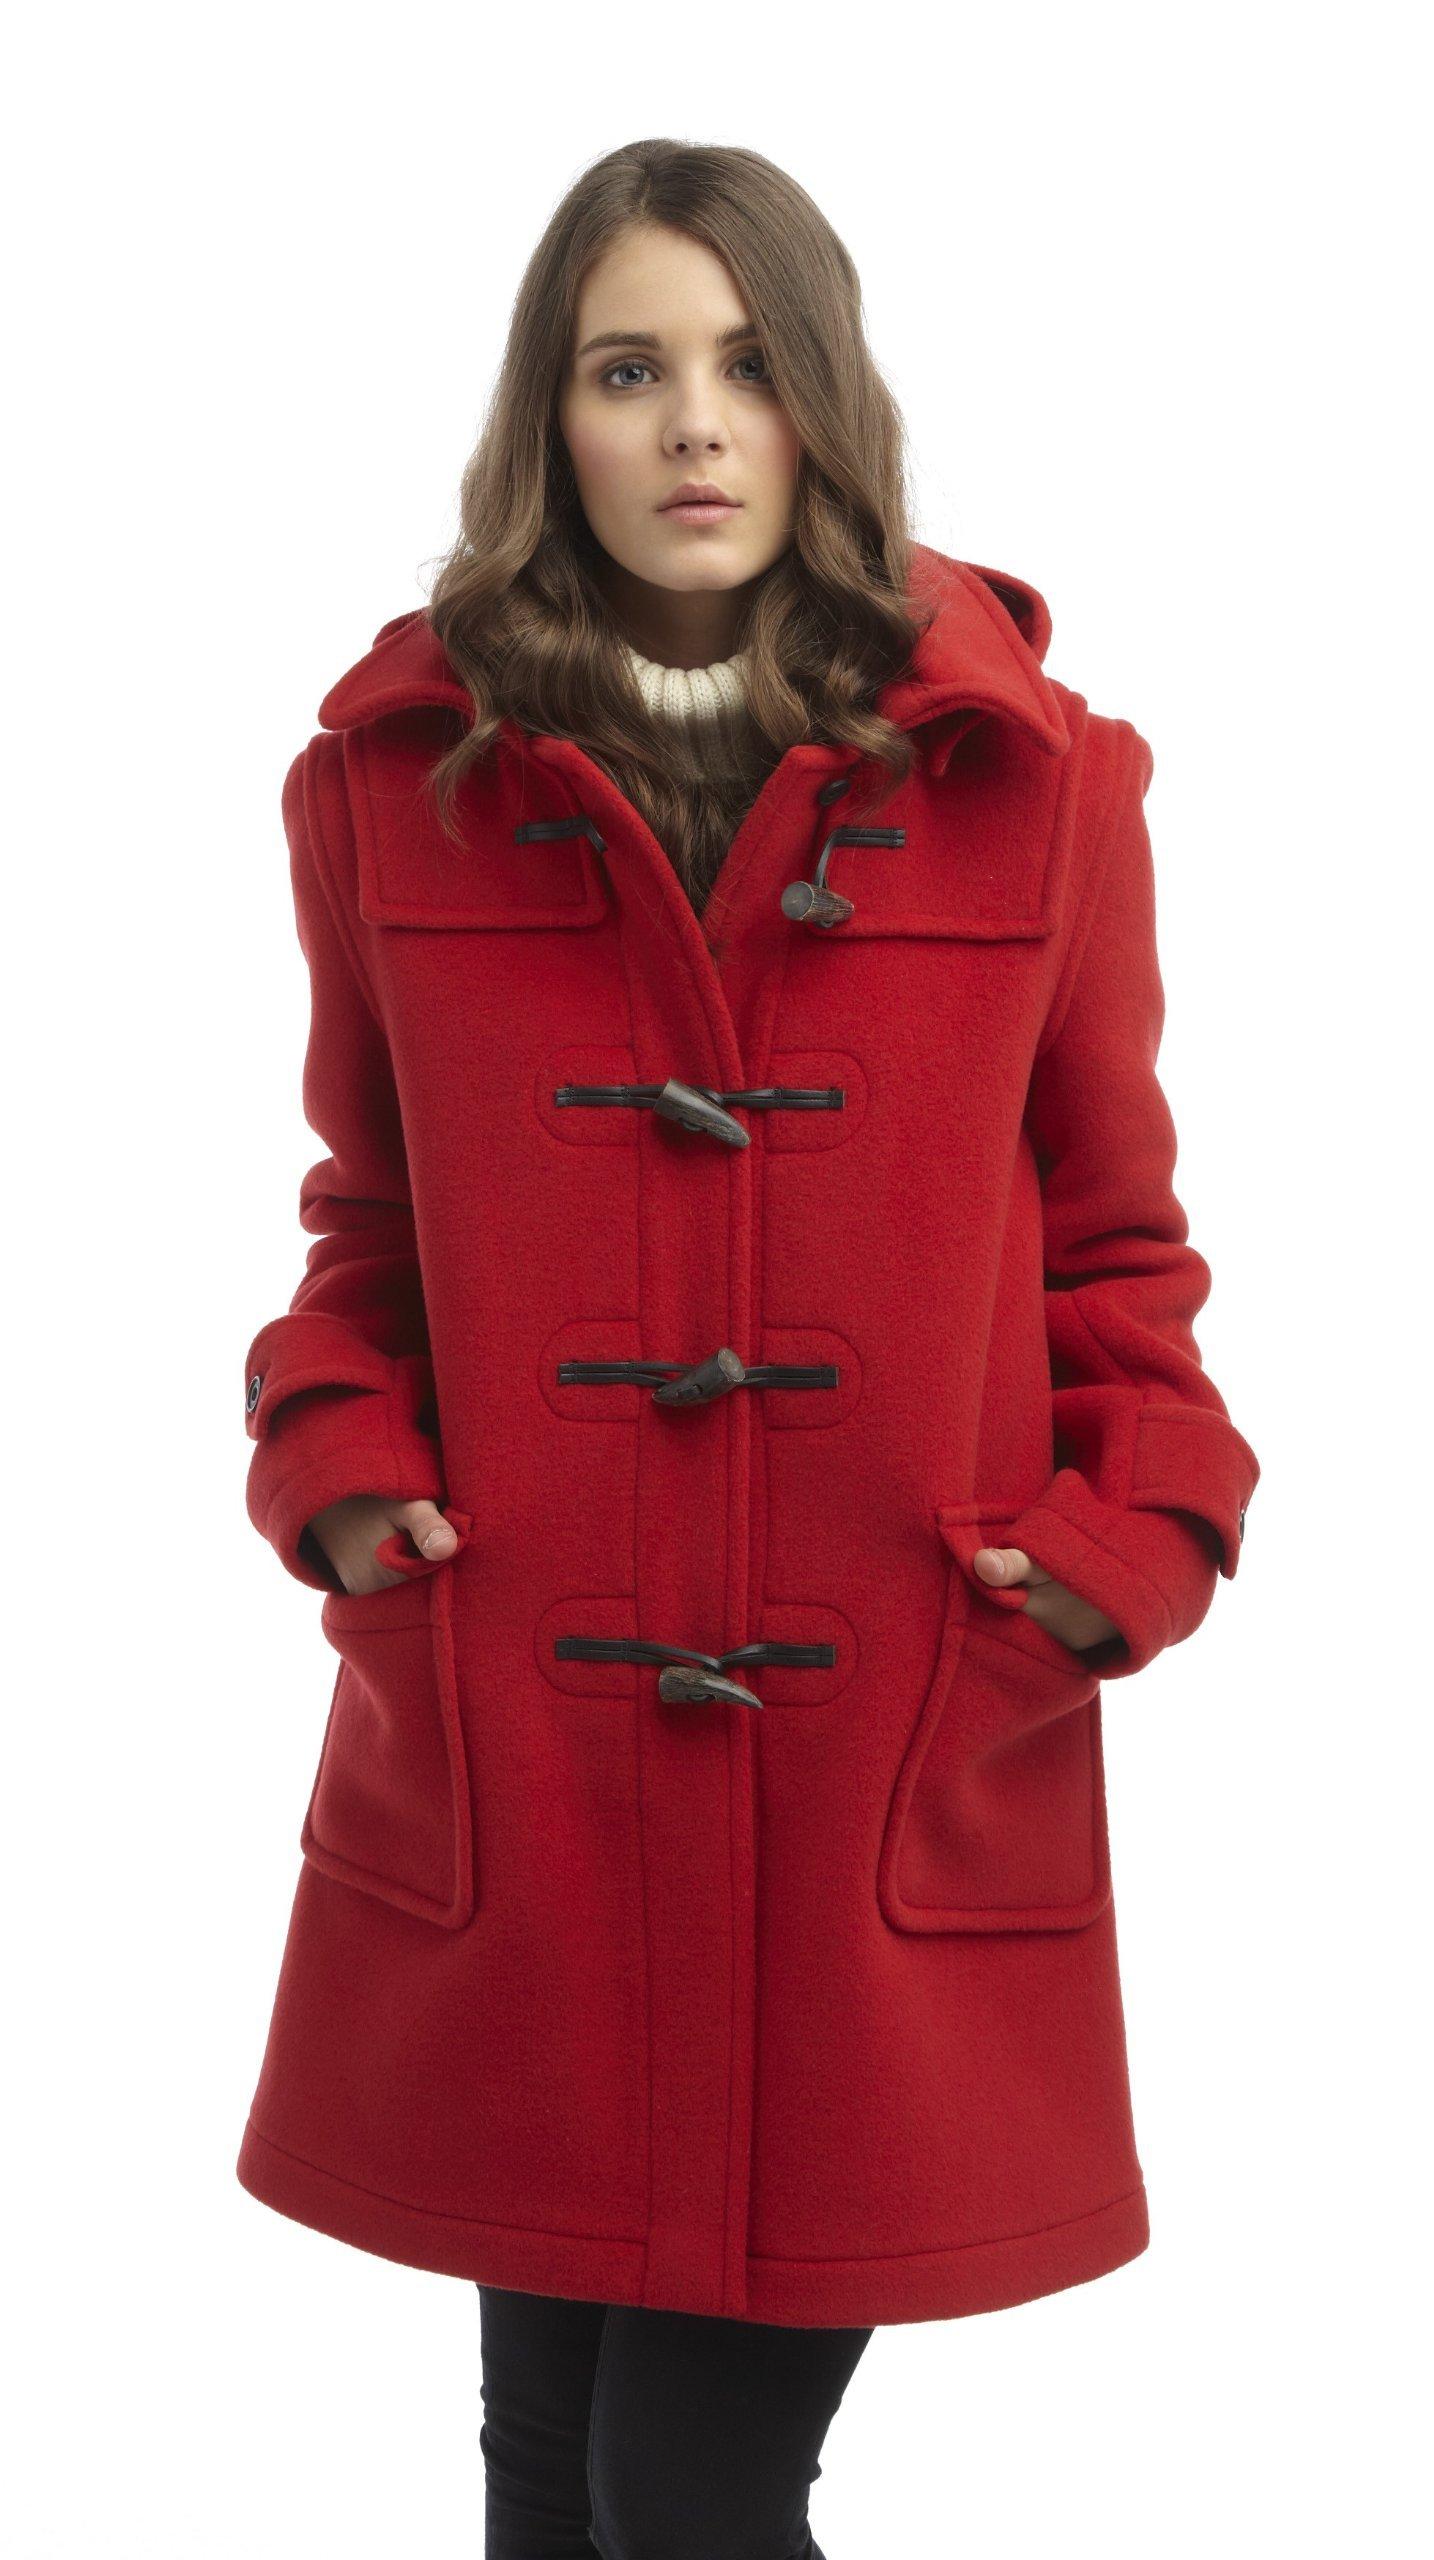 Womens London Luxury Duffle Coat (06, Red) by Original Montgomery